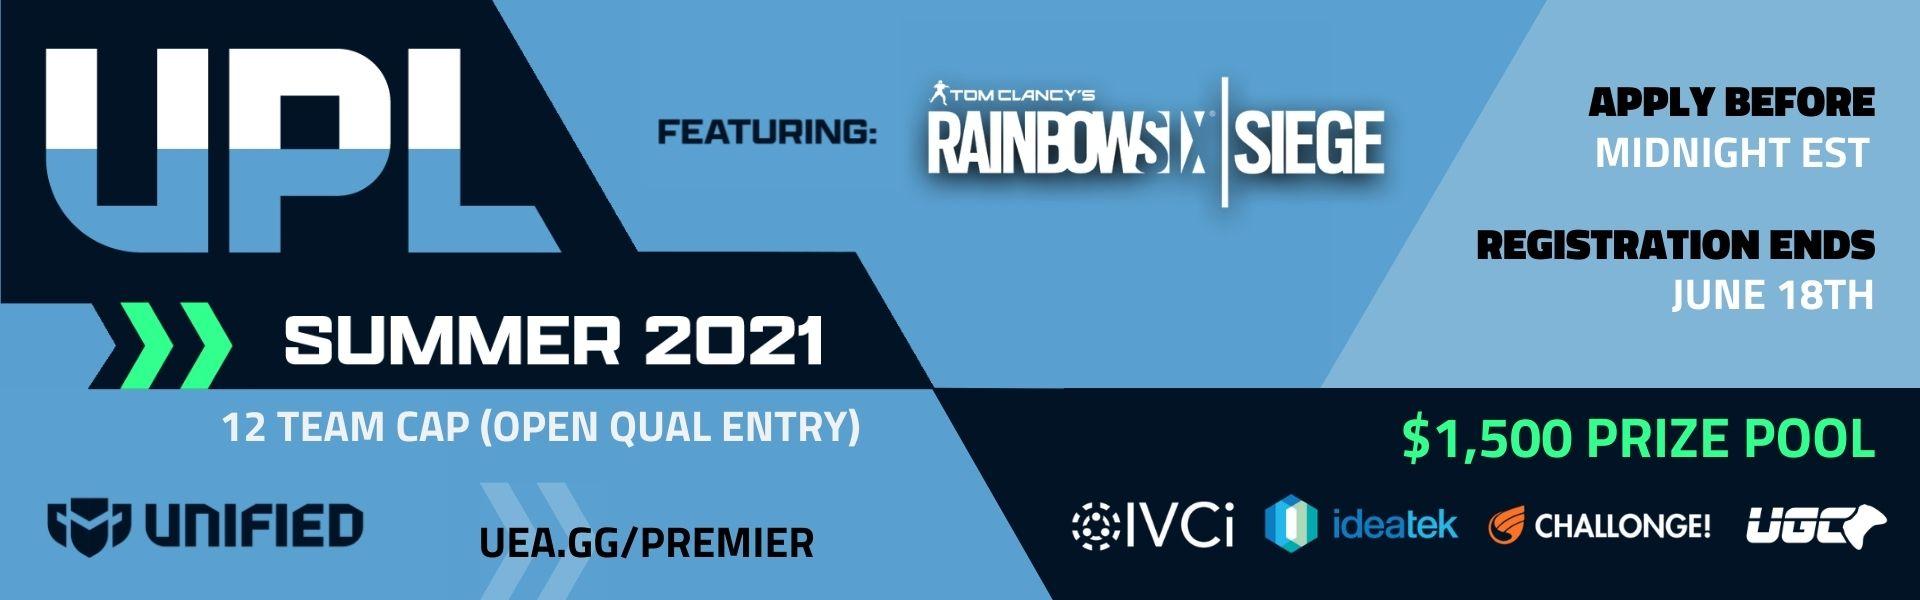 Upsurge Premier League - Rainbow Six Siege - Summer 2021